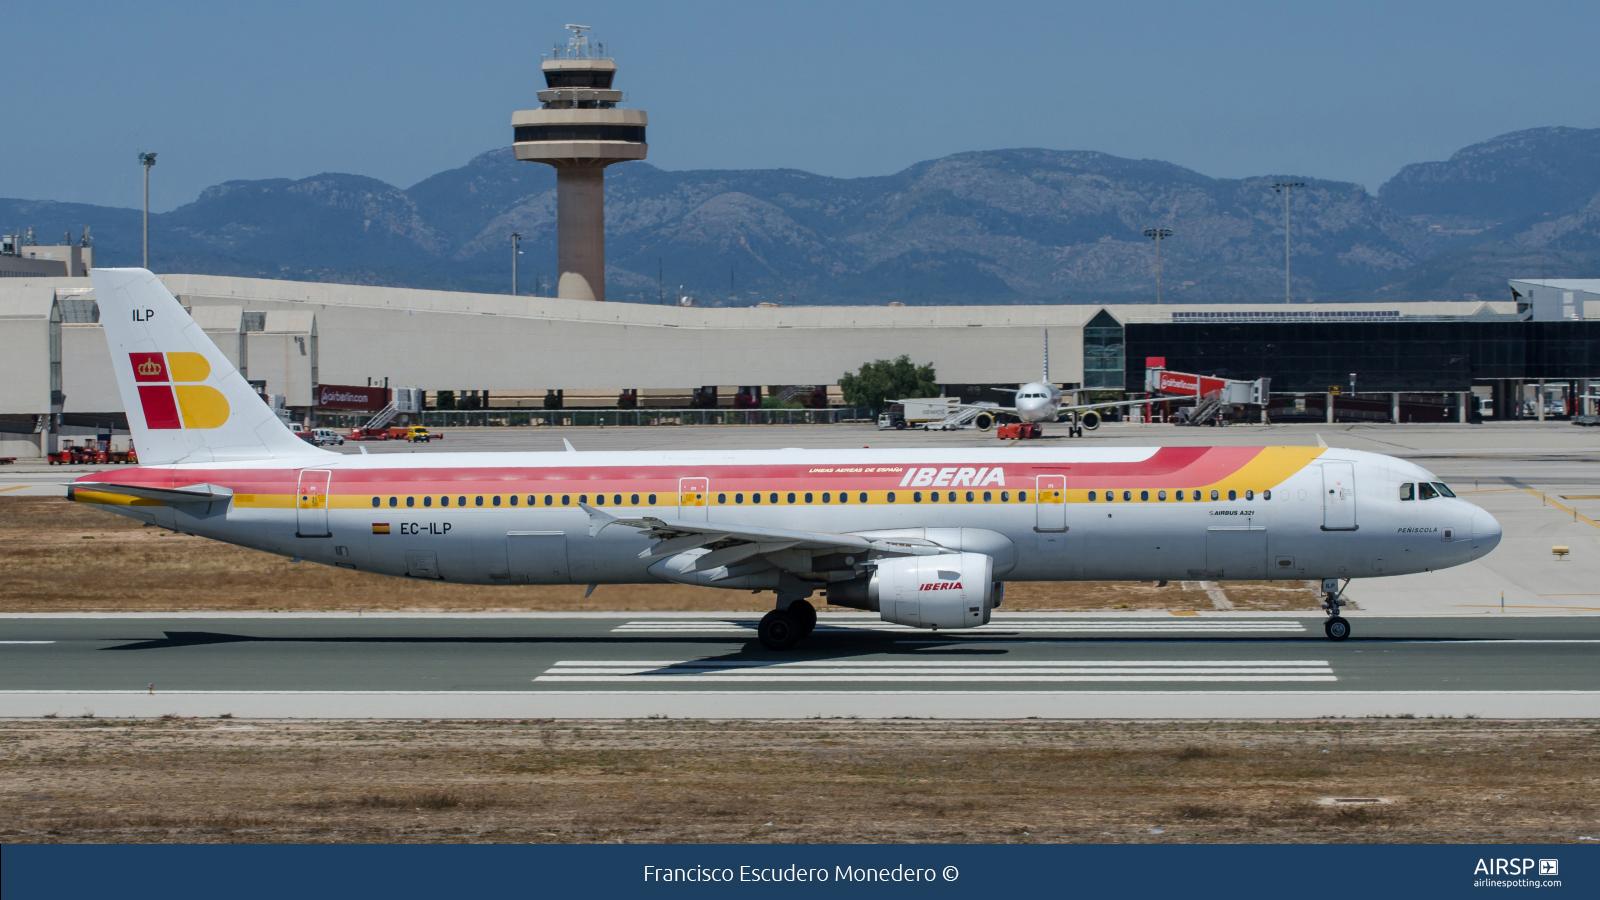 IberiaAirbus A321EC-ILP